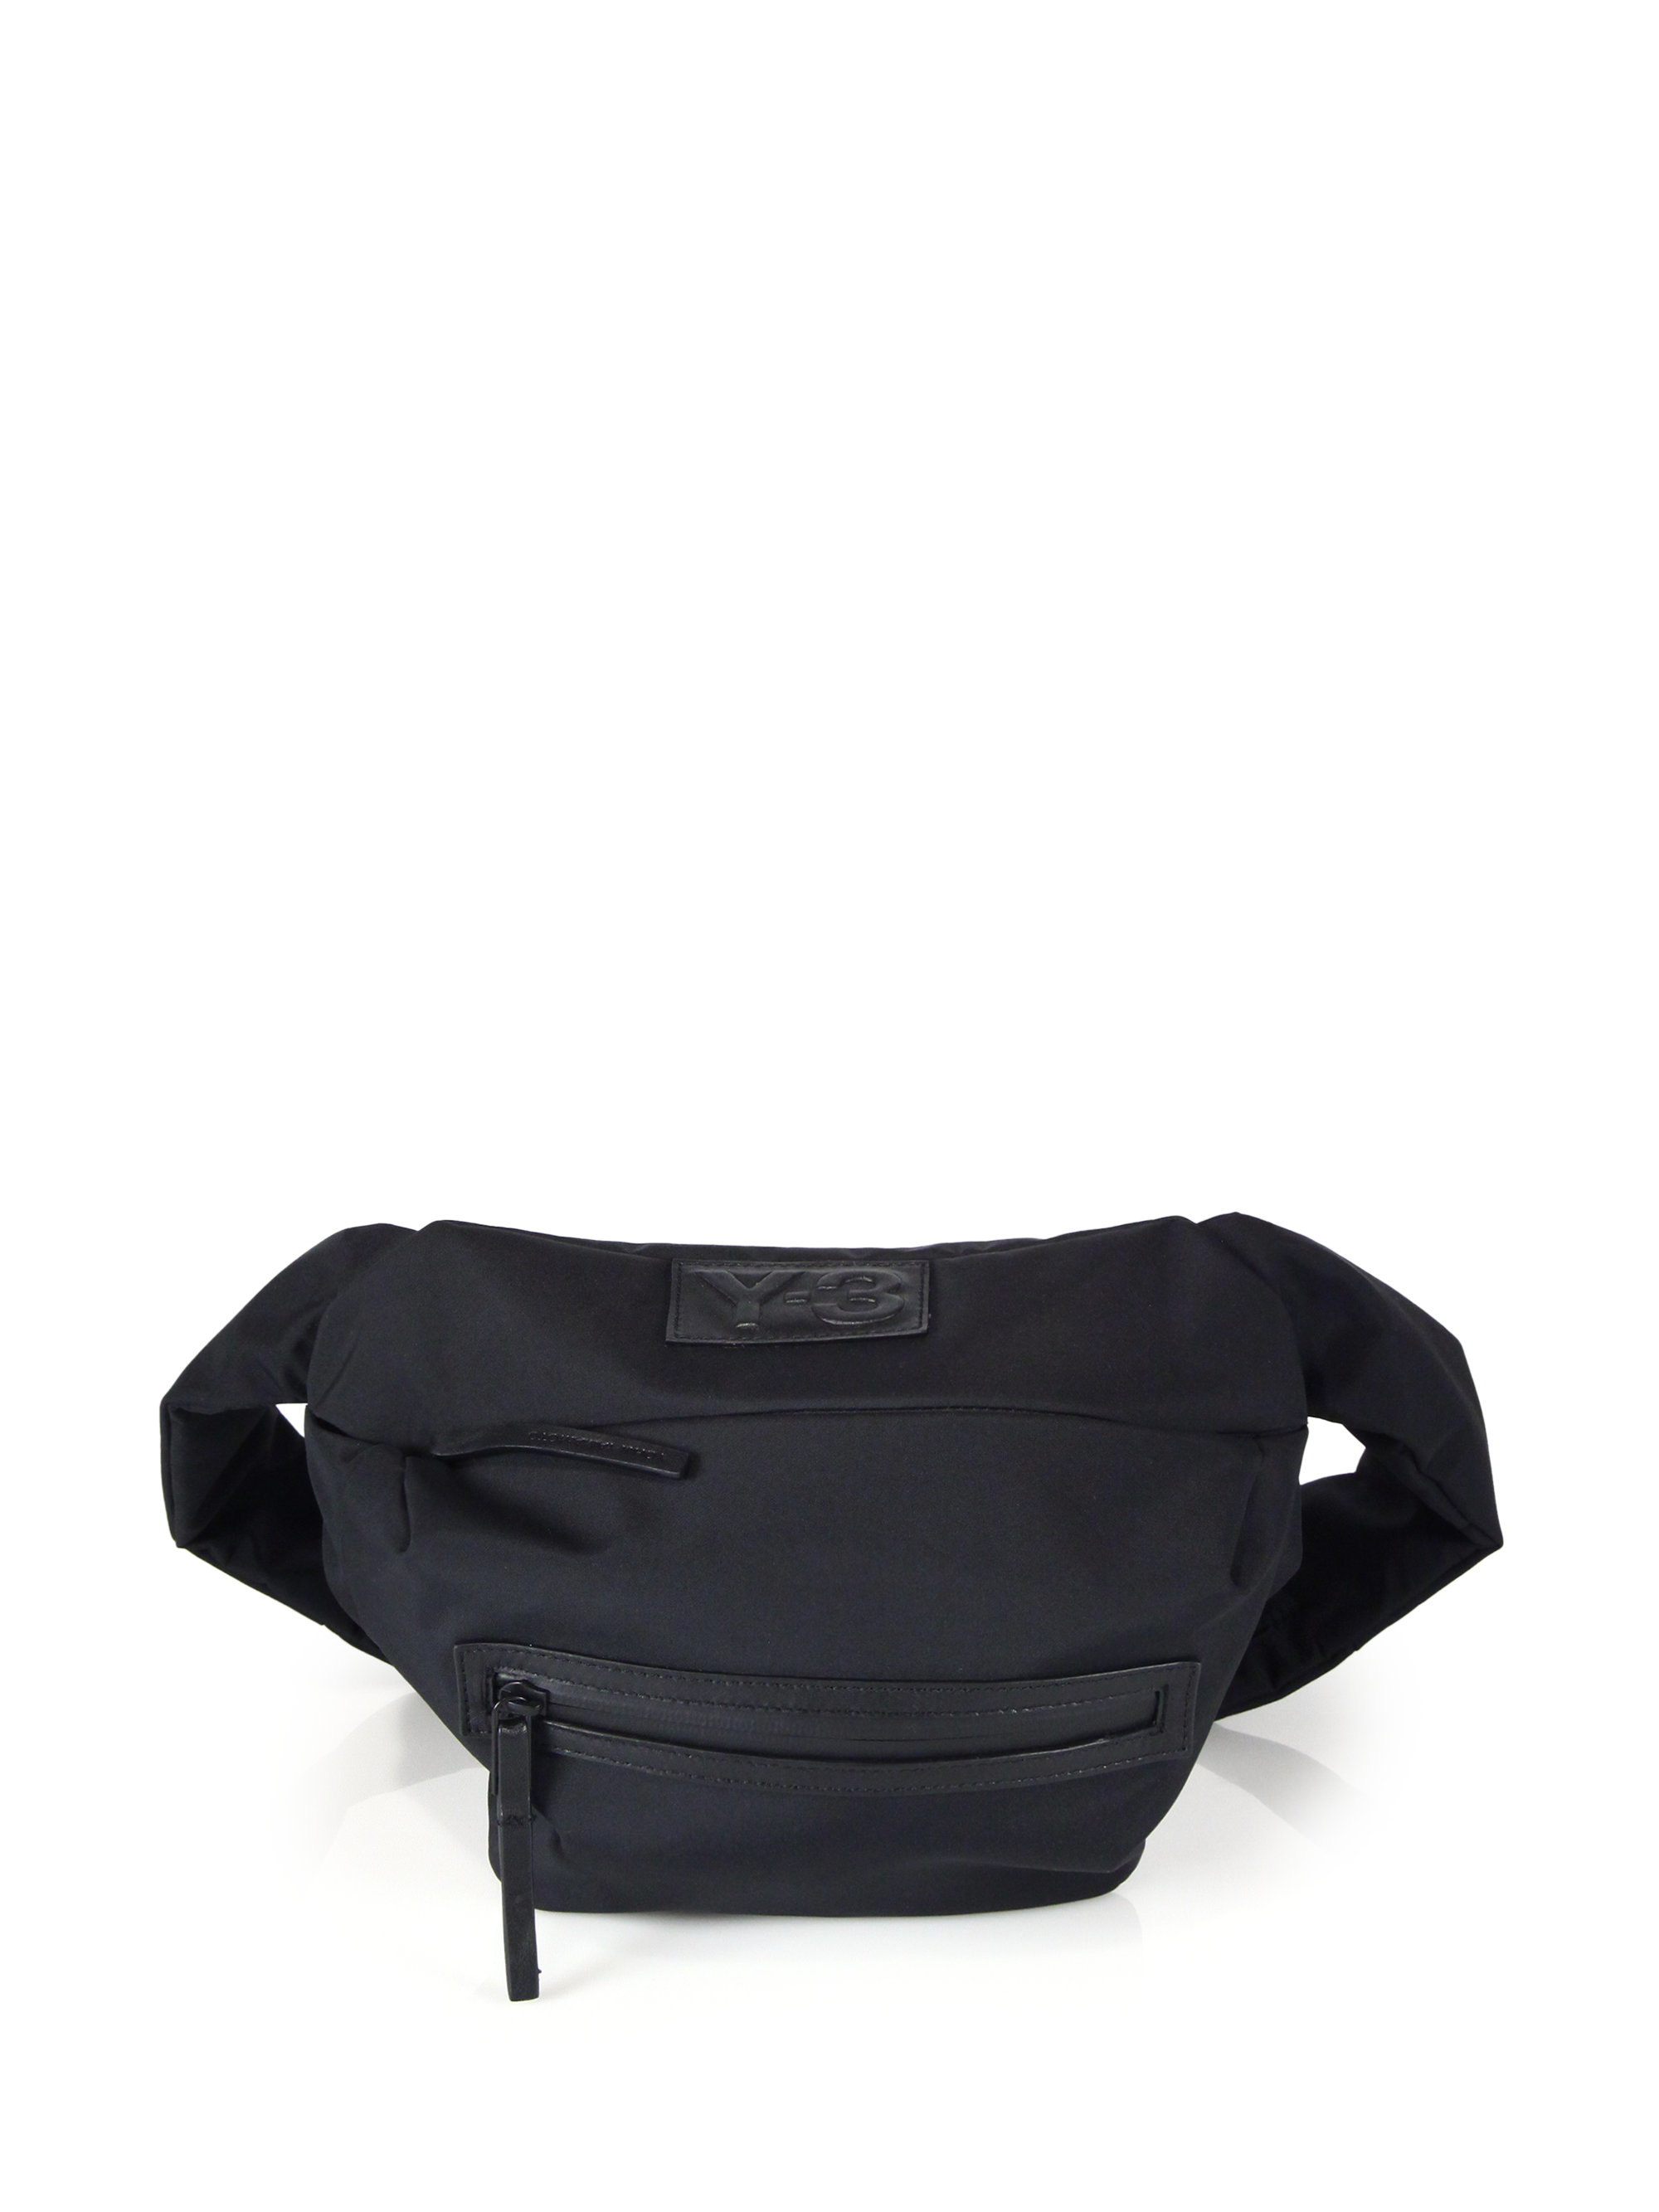 c625aaf9aa Lyst - Y-3 Qasa Bum Bag in Black for Men